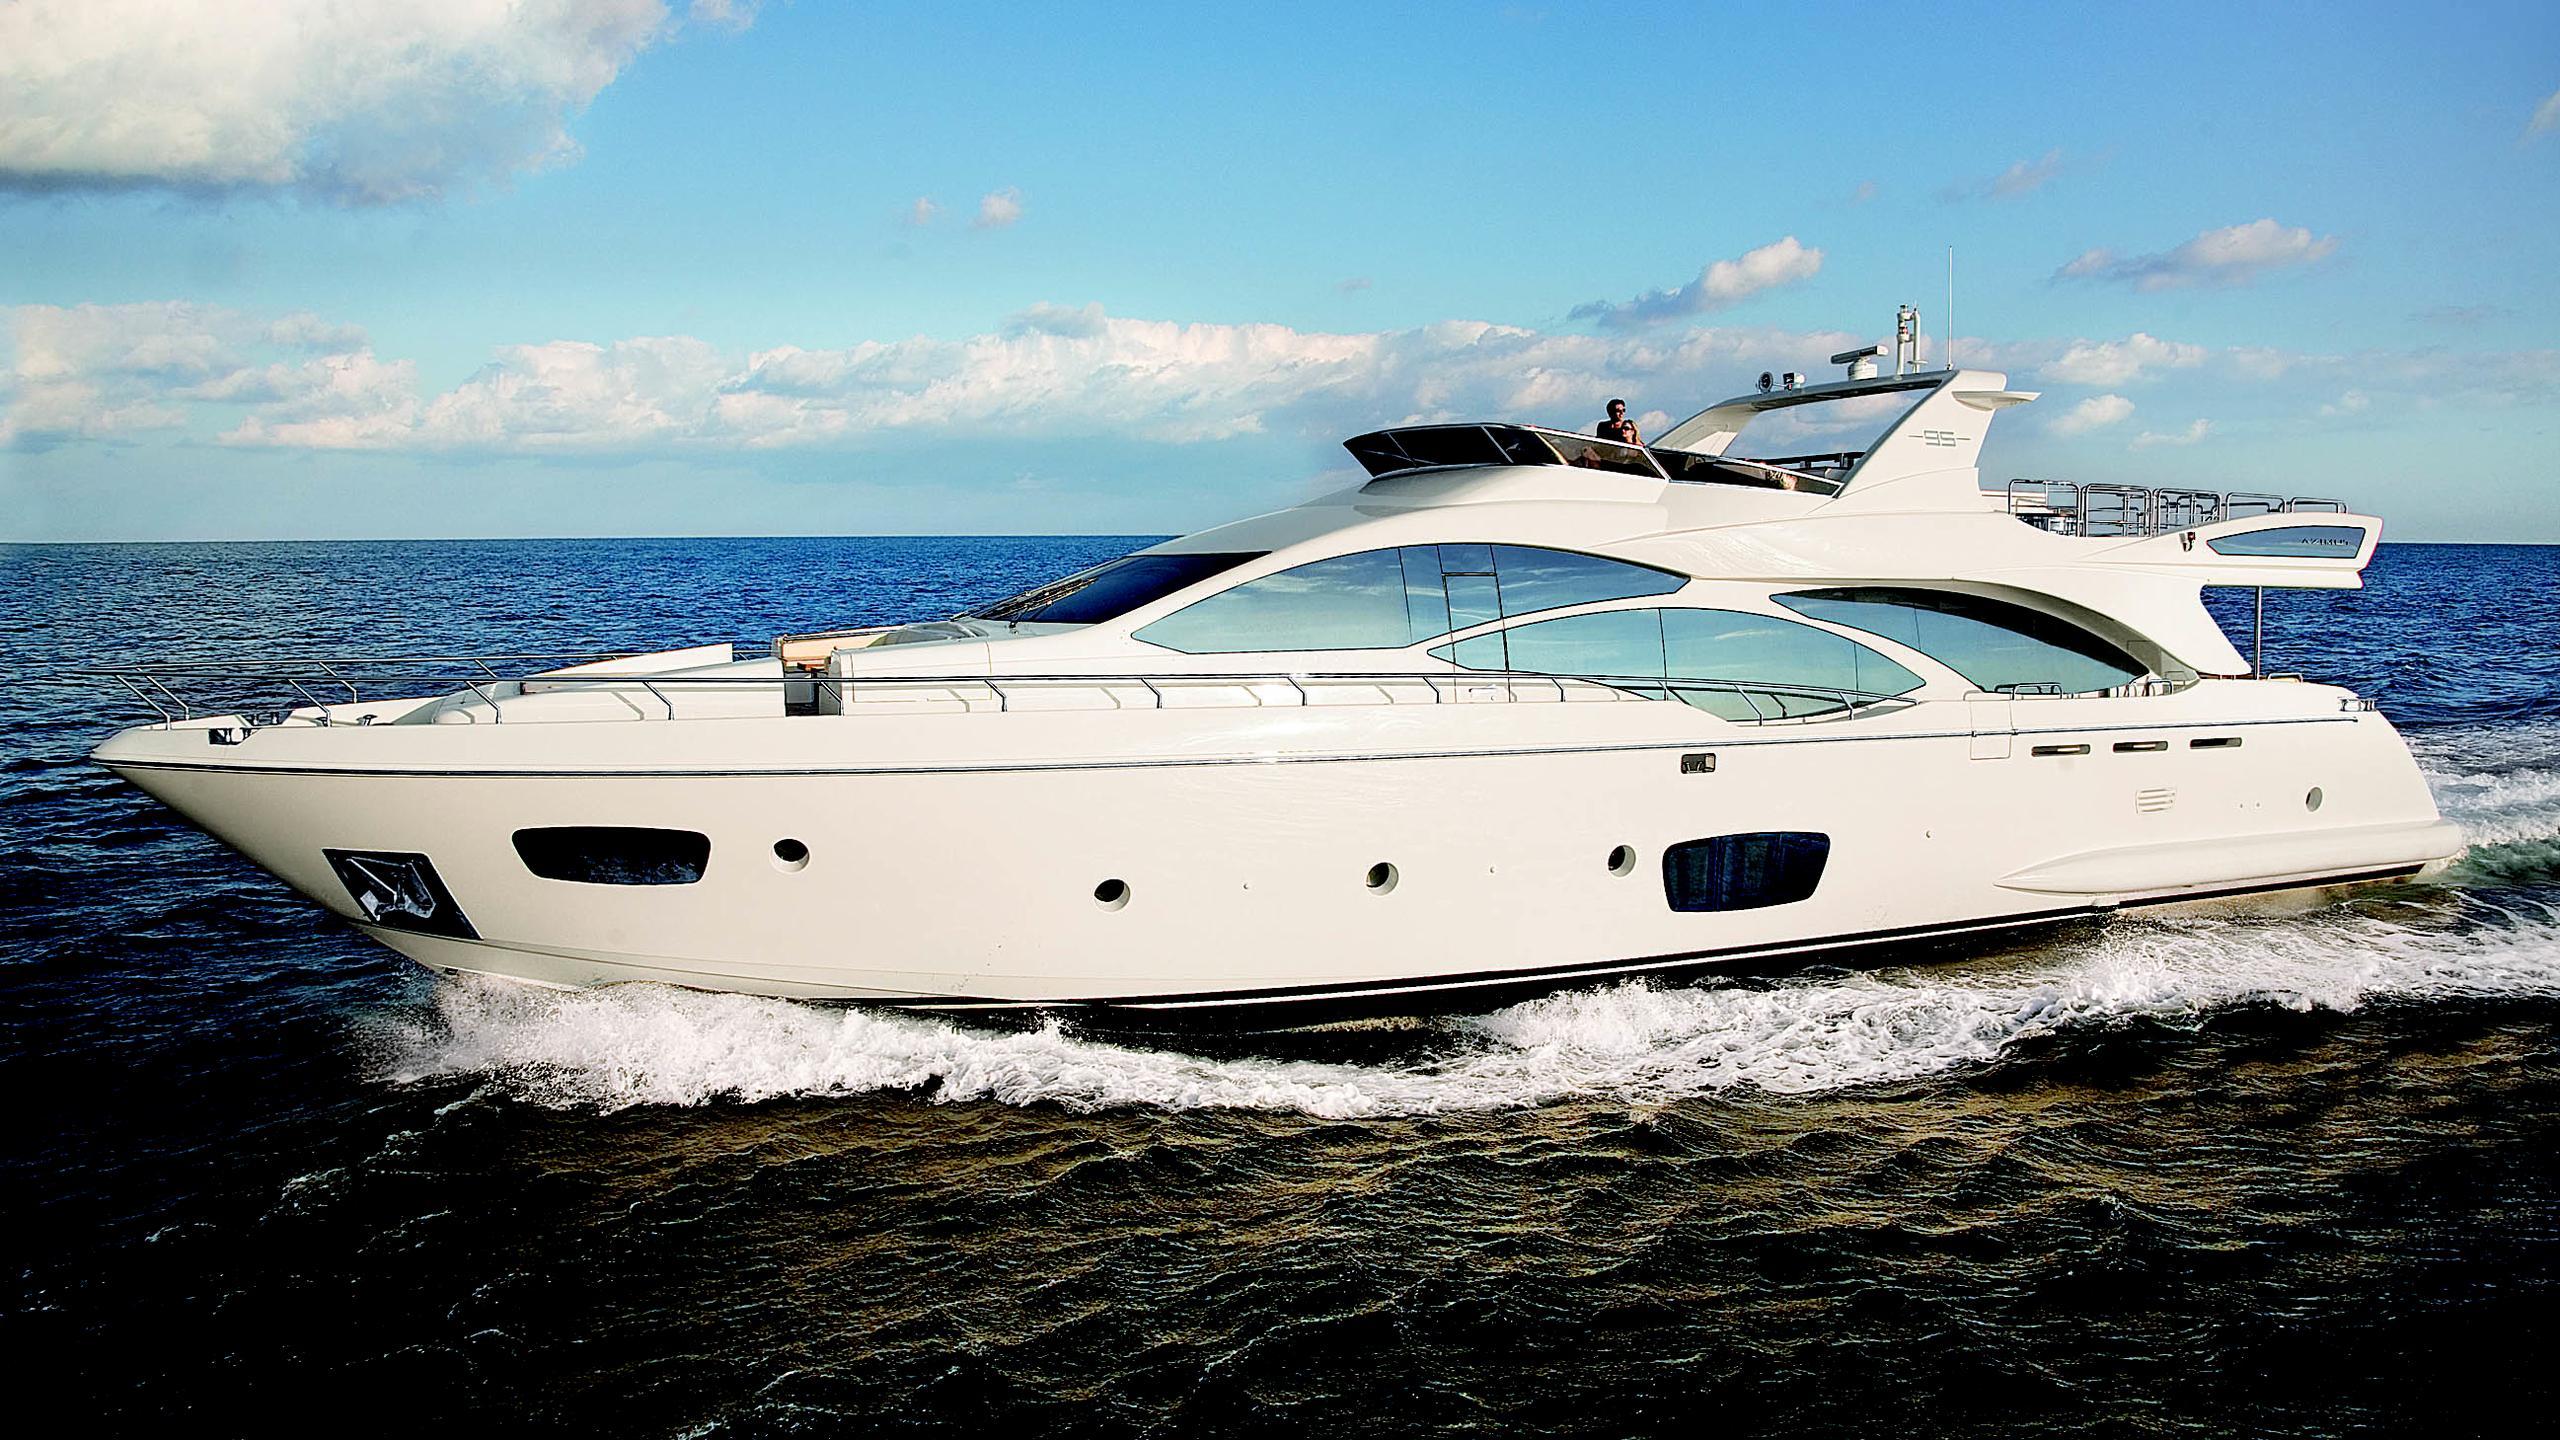 my-dream-azimut-95-motor-yacht-2007-30m-profile